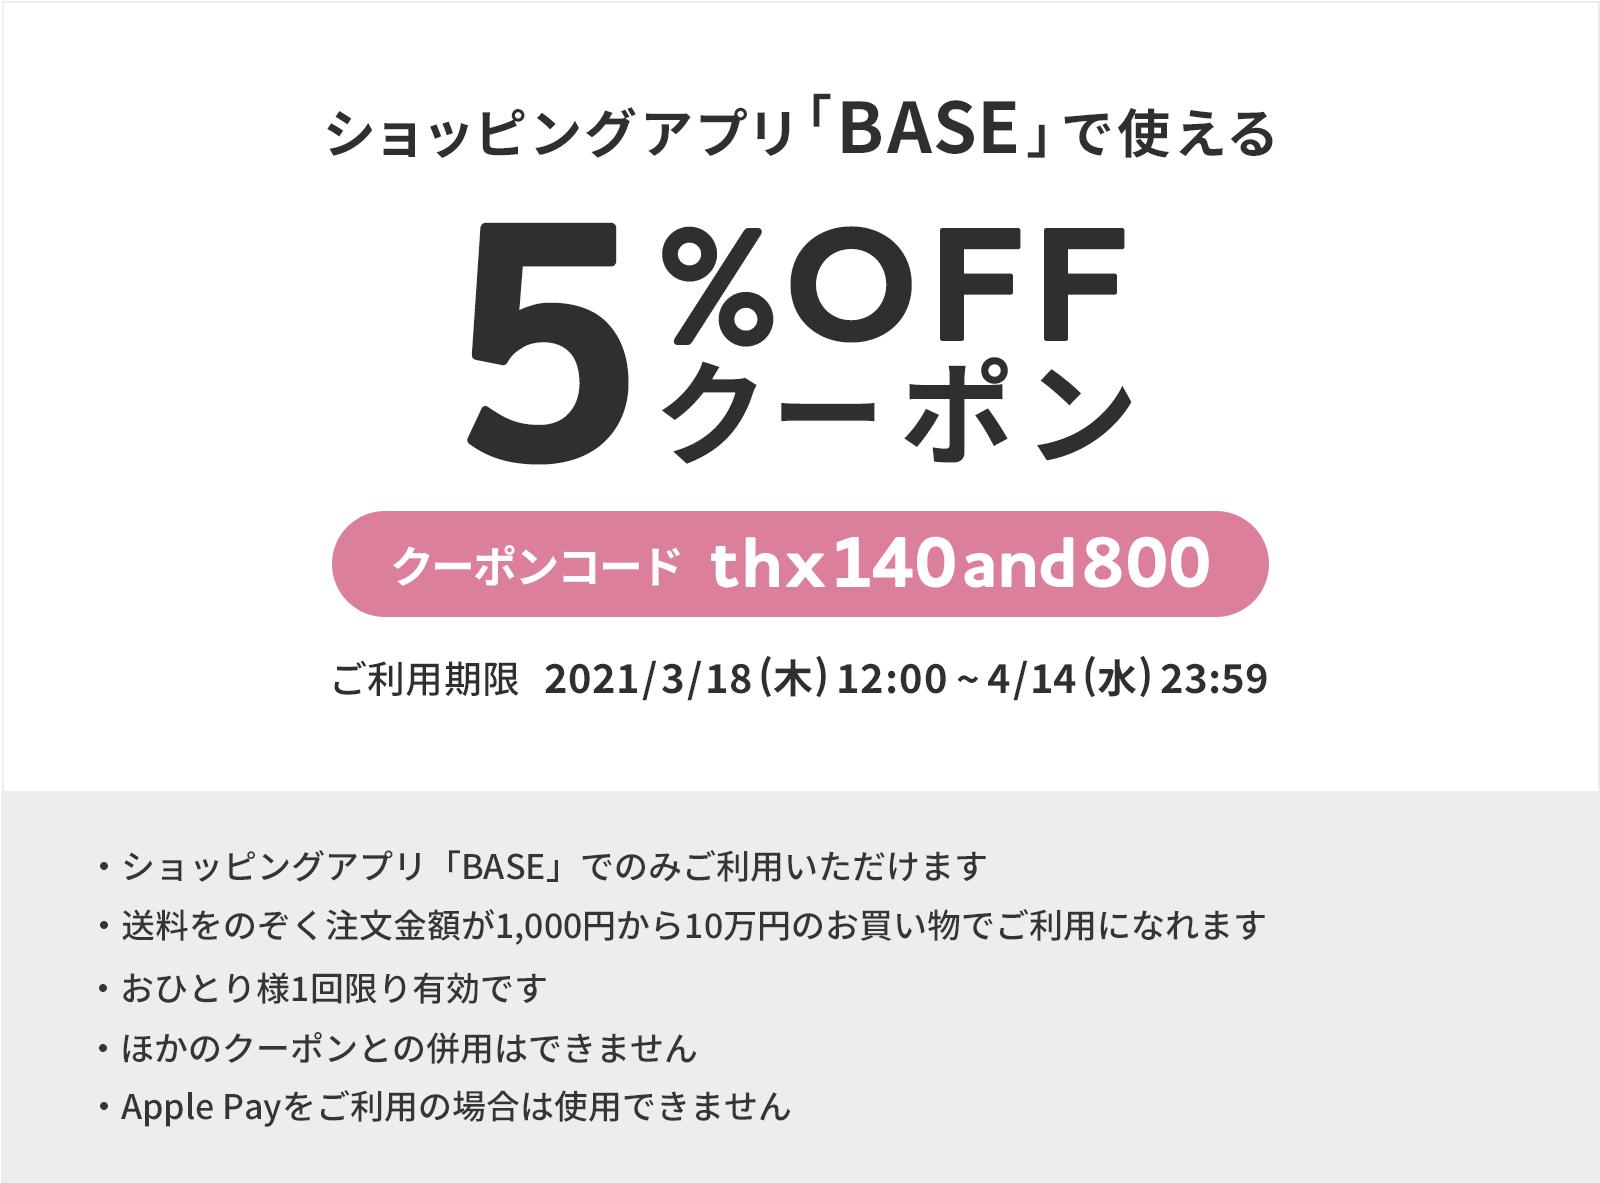 【BASEアプリ専用】5%オフクーポン配布中